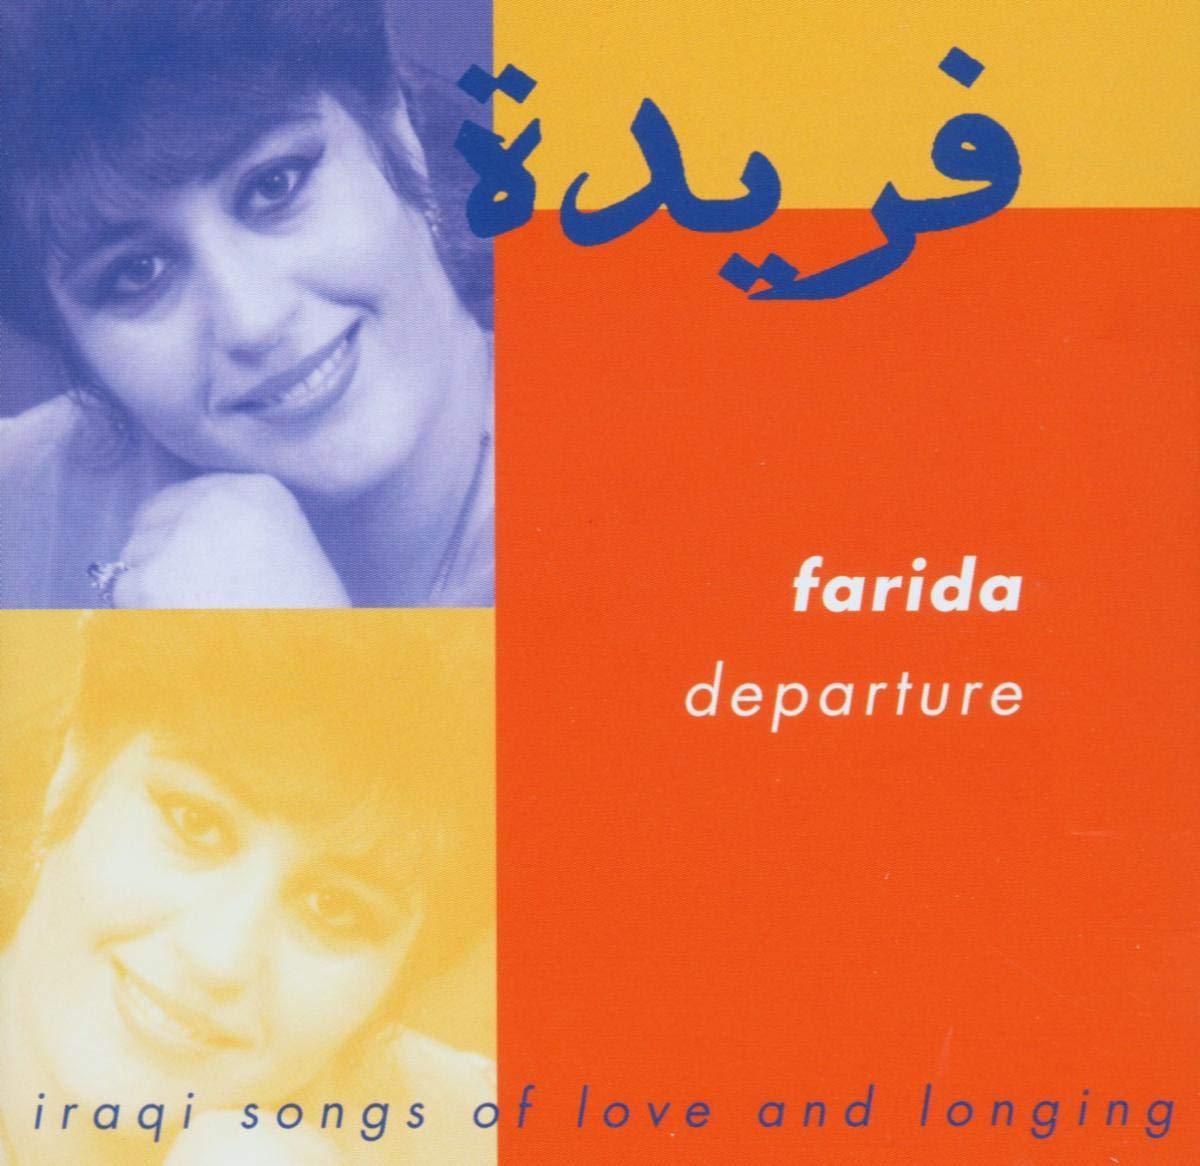 Farida Departure Iraqi Songs Of Love And Longing Amazon Com Music